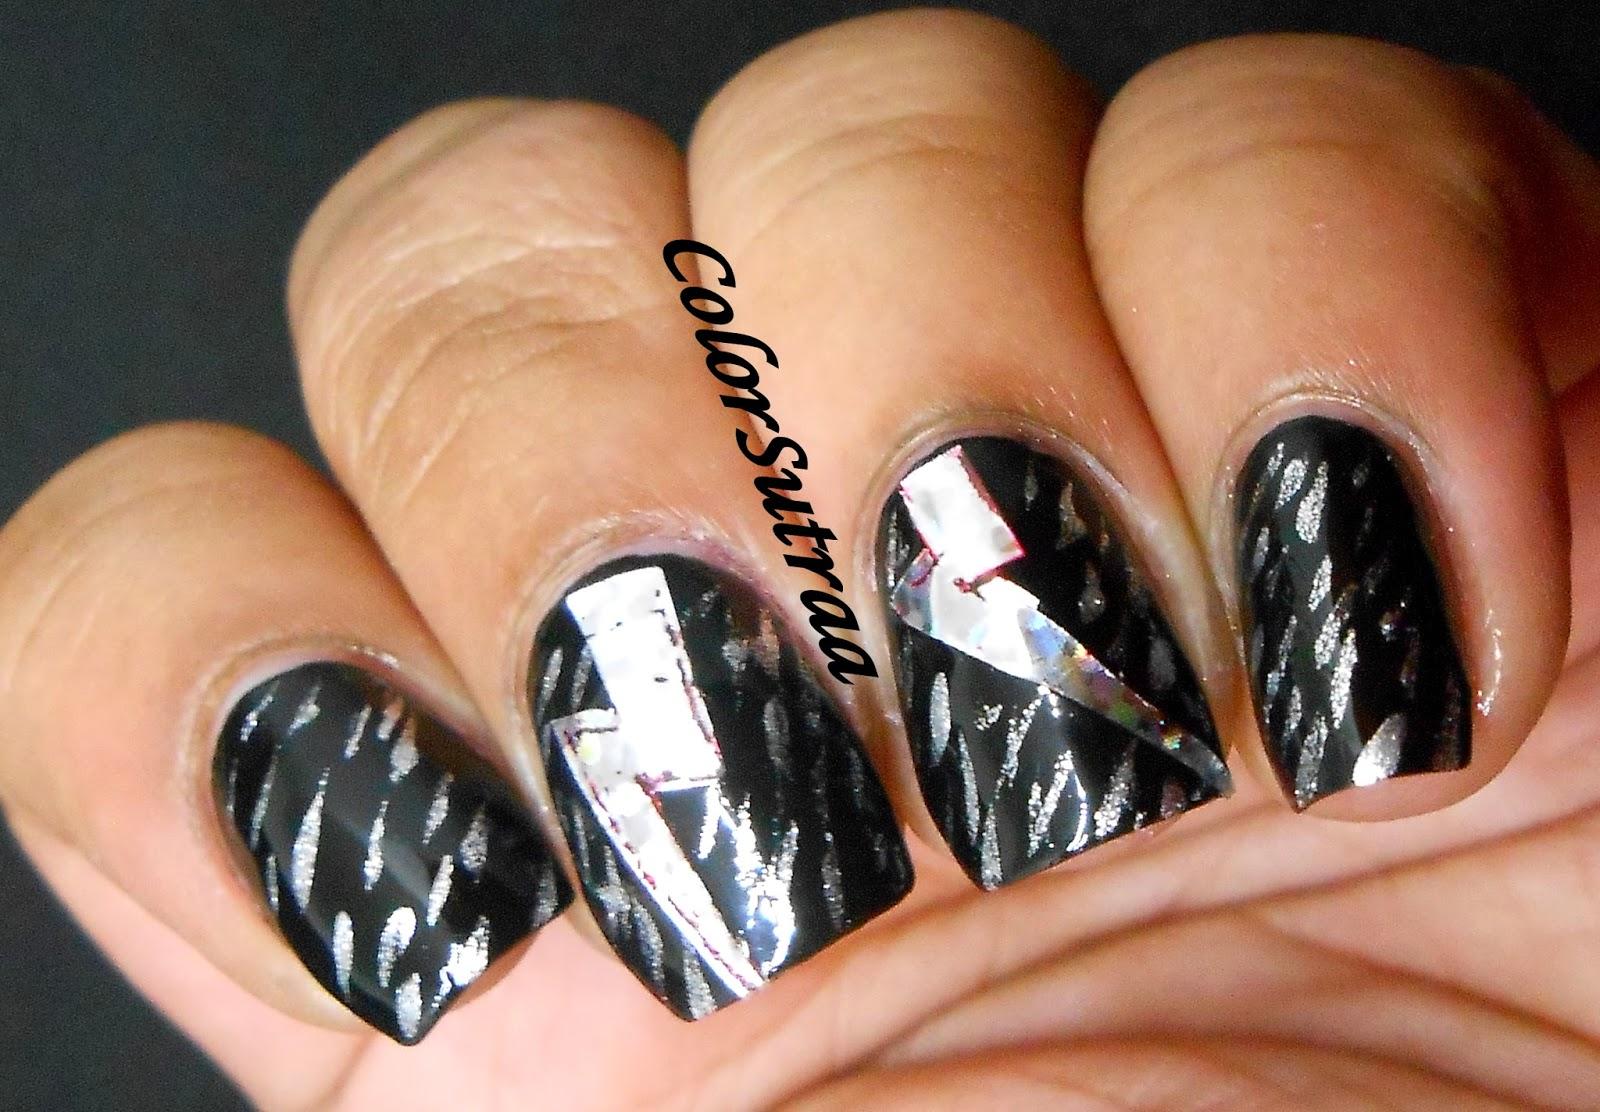 SALON PERFECT : Easy Nail Art Look created using Basic Black on ...